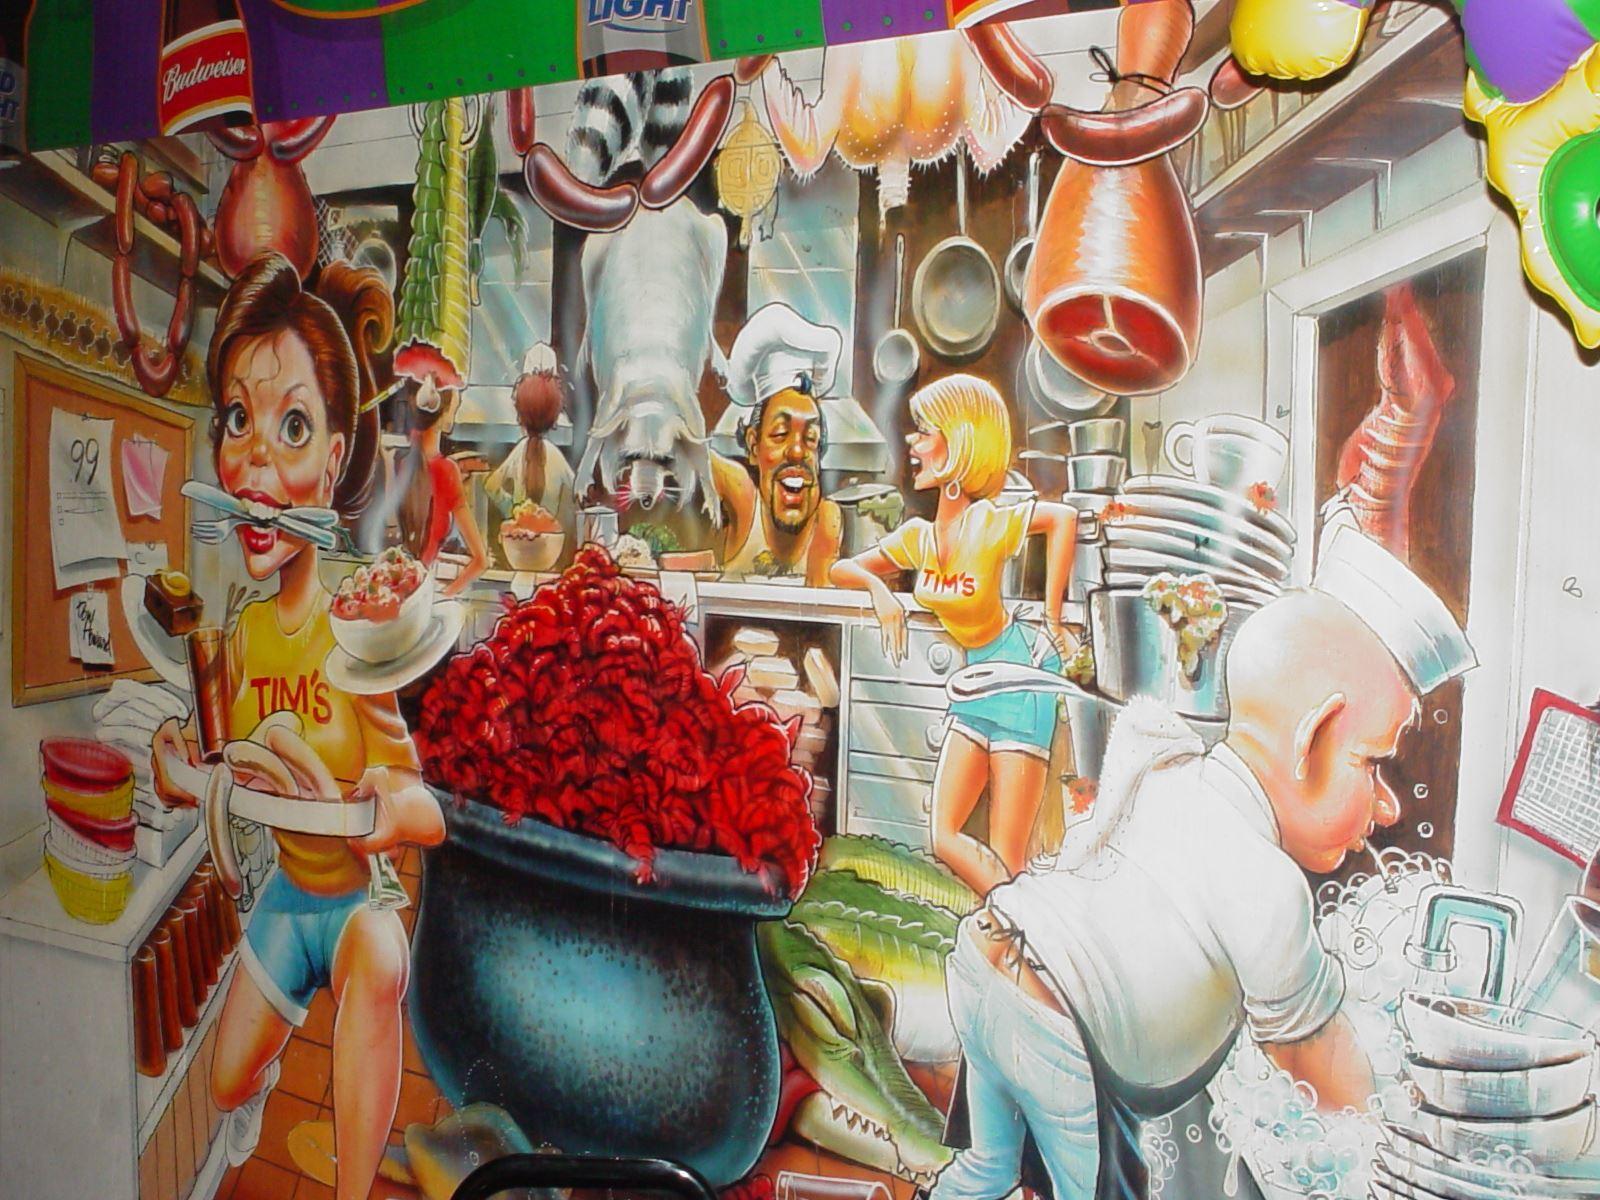 Tim S Cajun Kitchen Catering